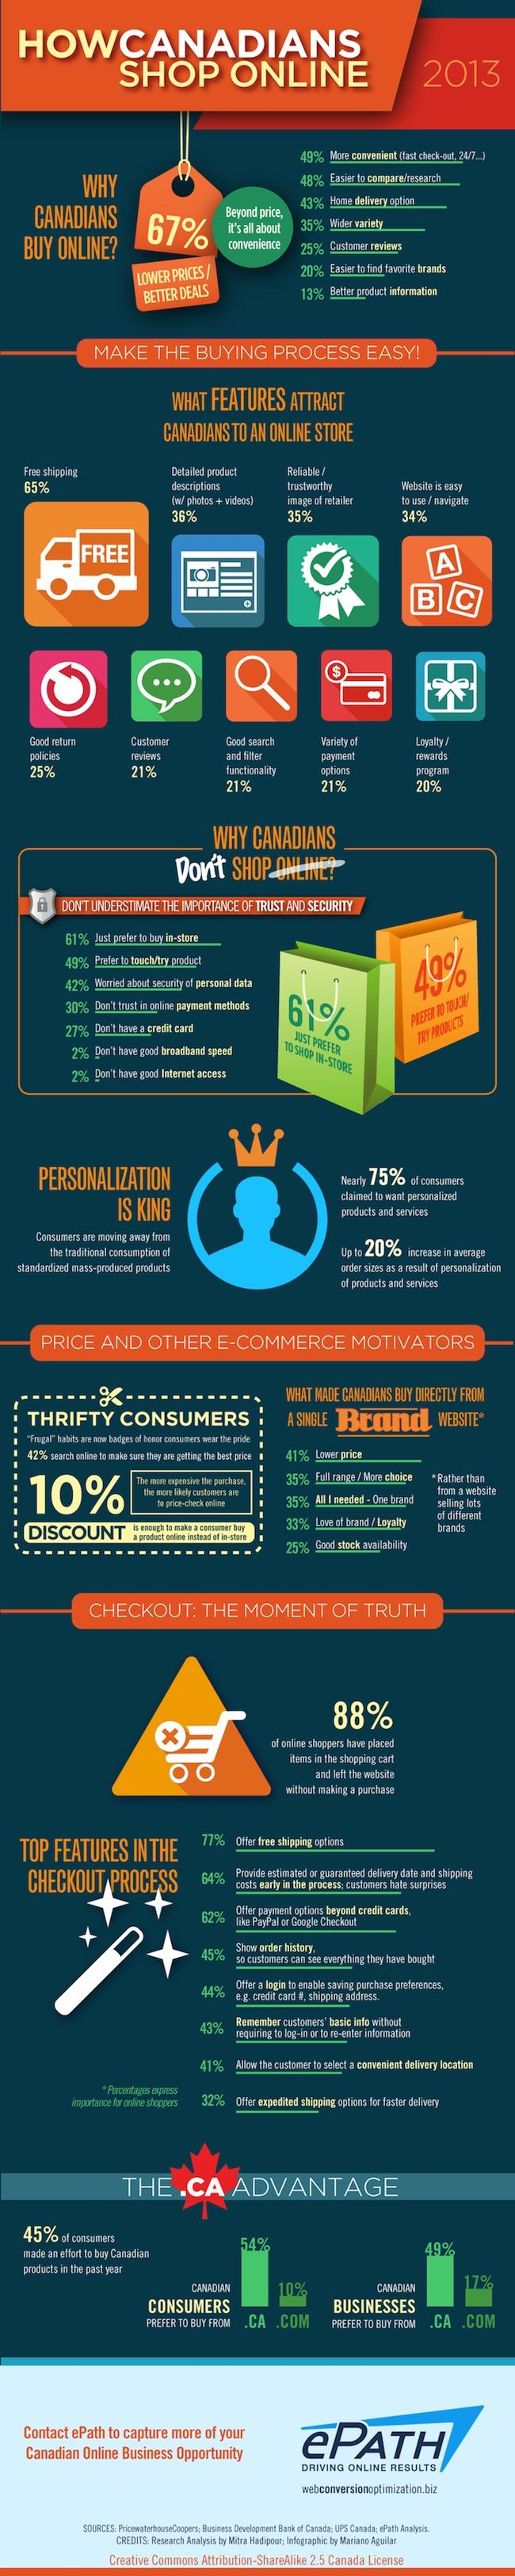 HOW_CANADIANS_SHOP_ONLINE | Infographic | ePath eCommerce Consultants